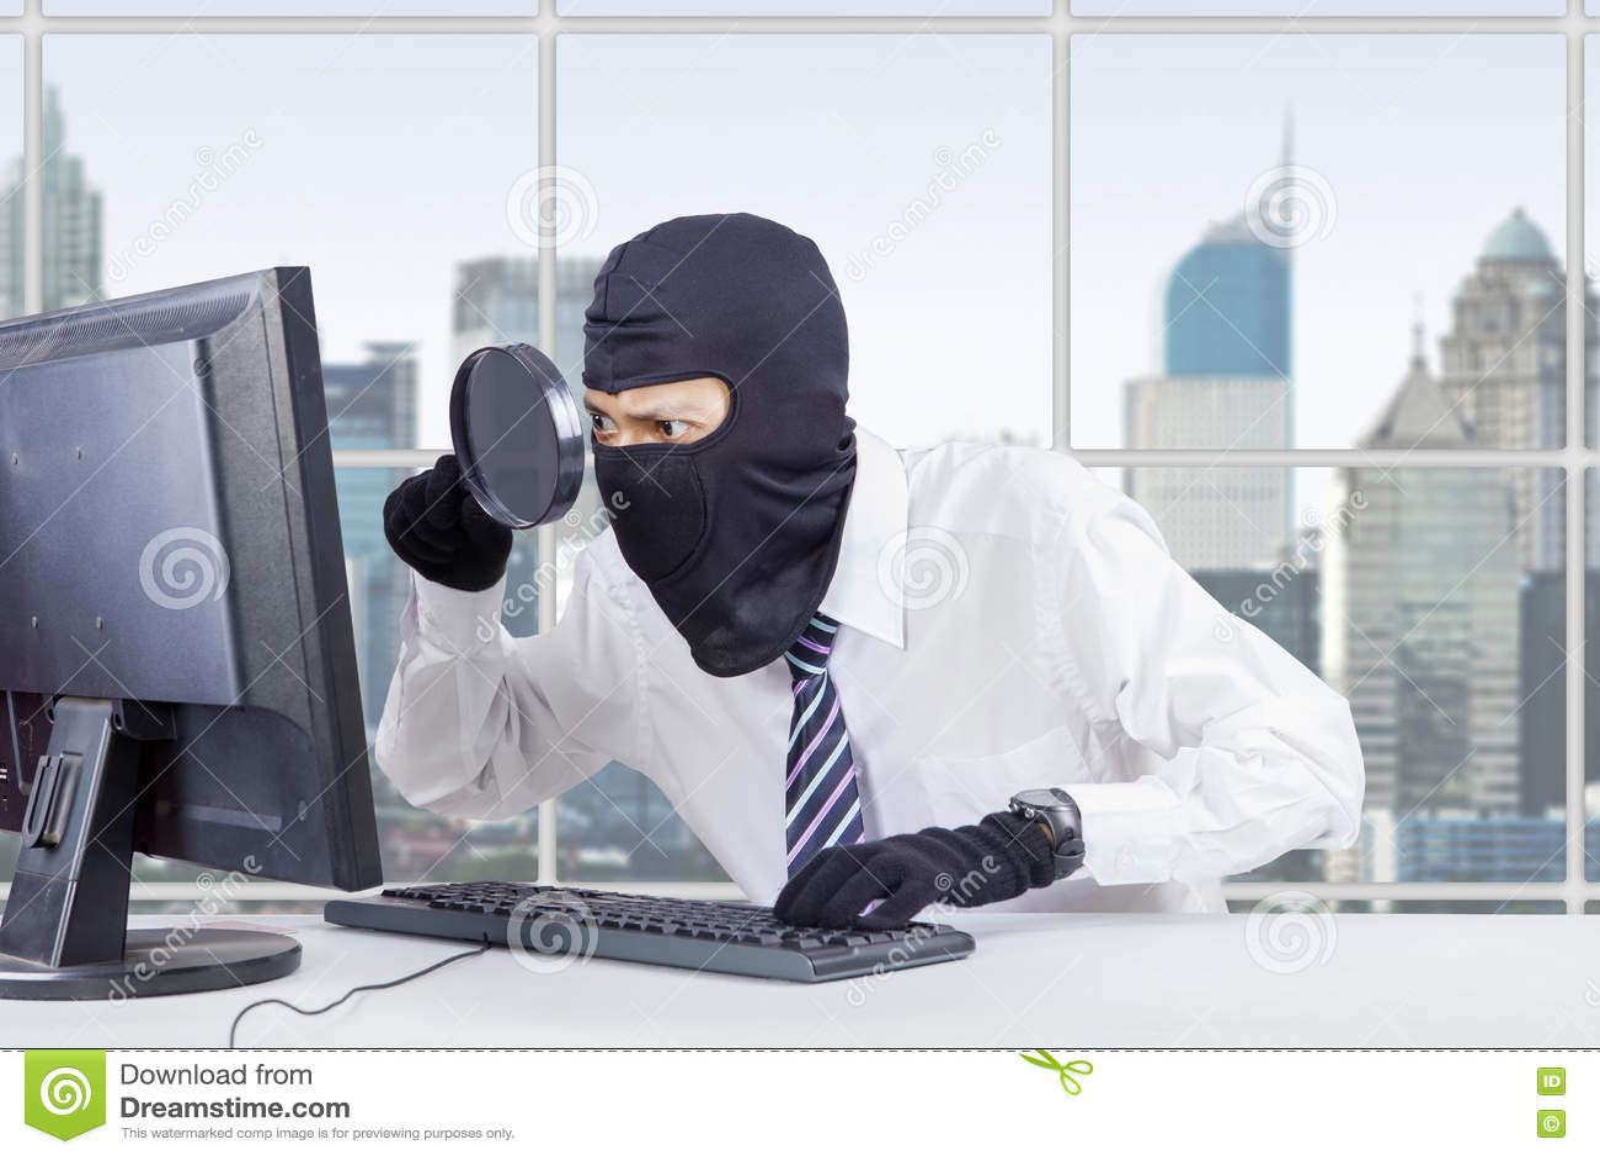 Meer magnifier hakkergebruik en masker om gegevens te stelen